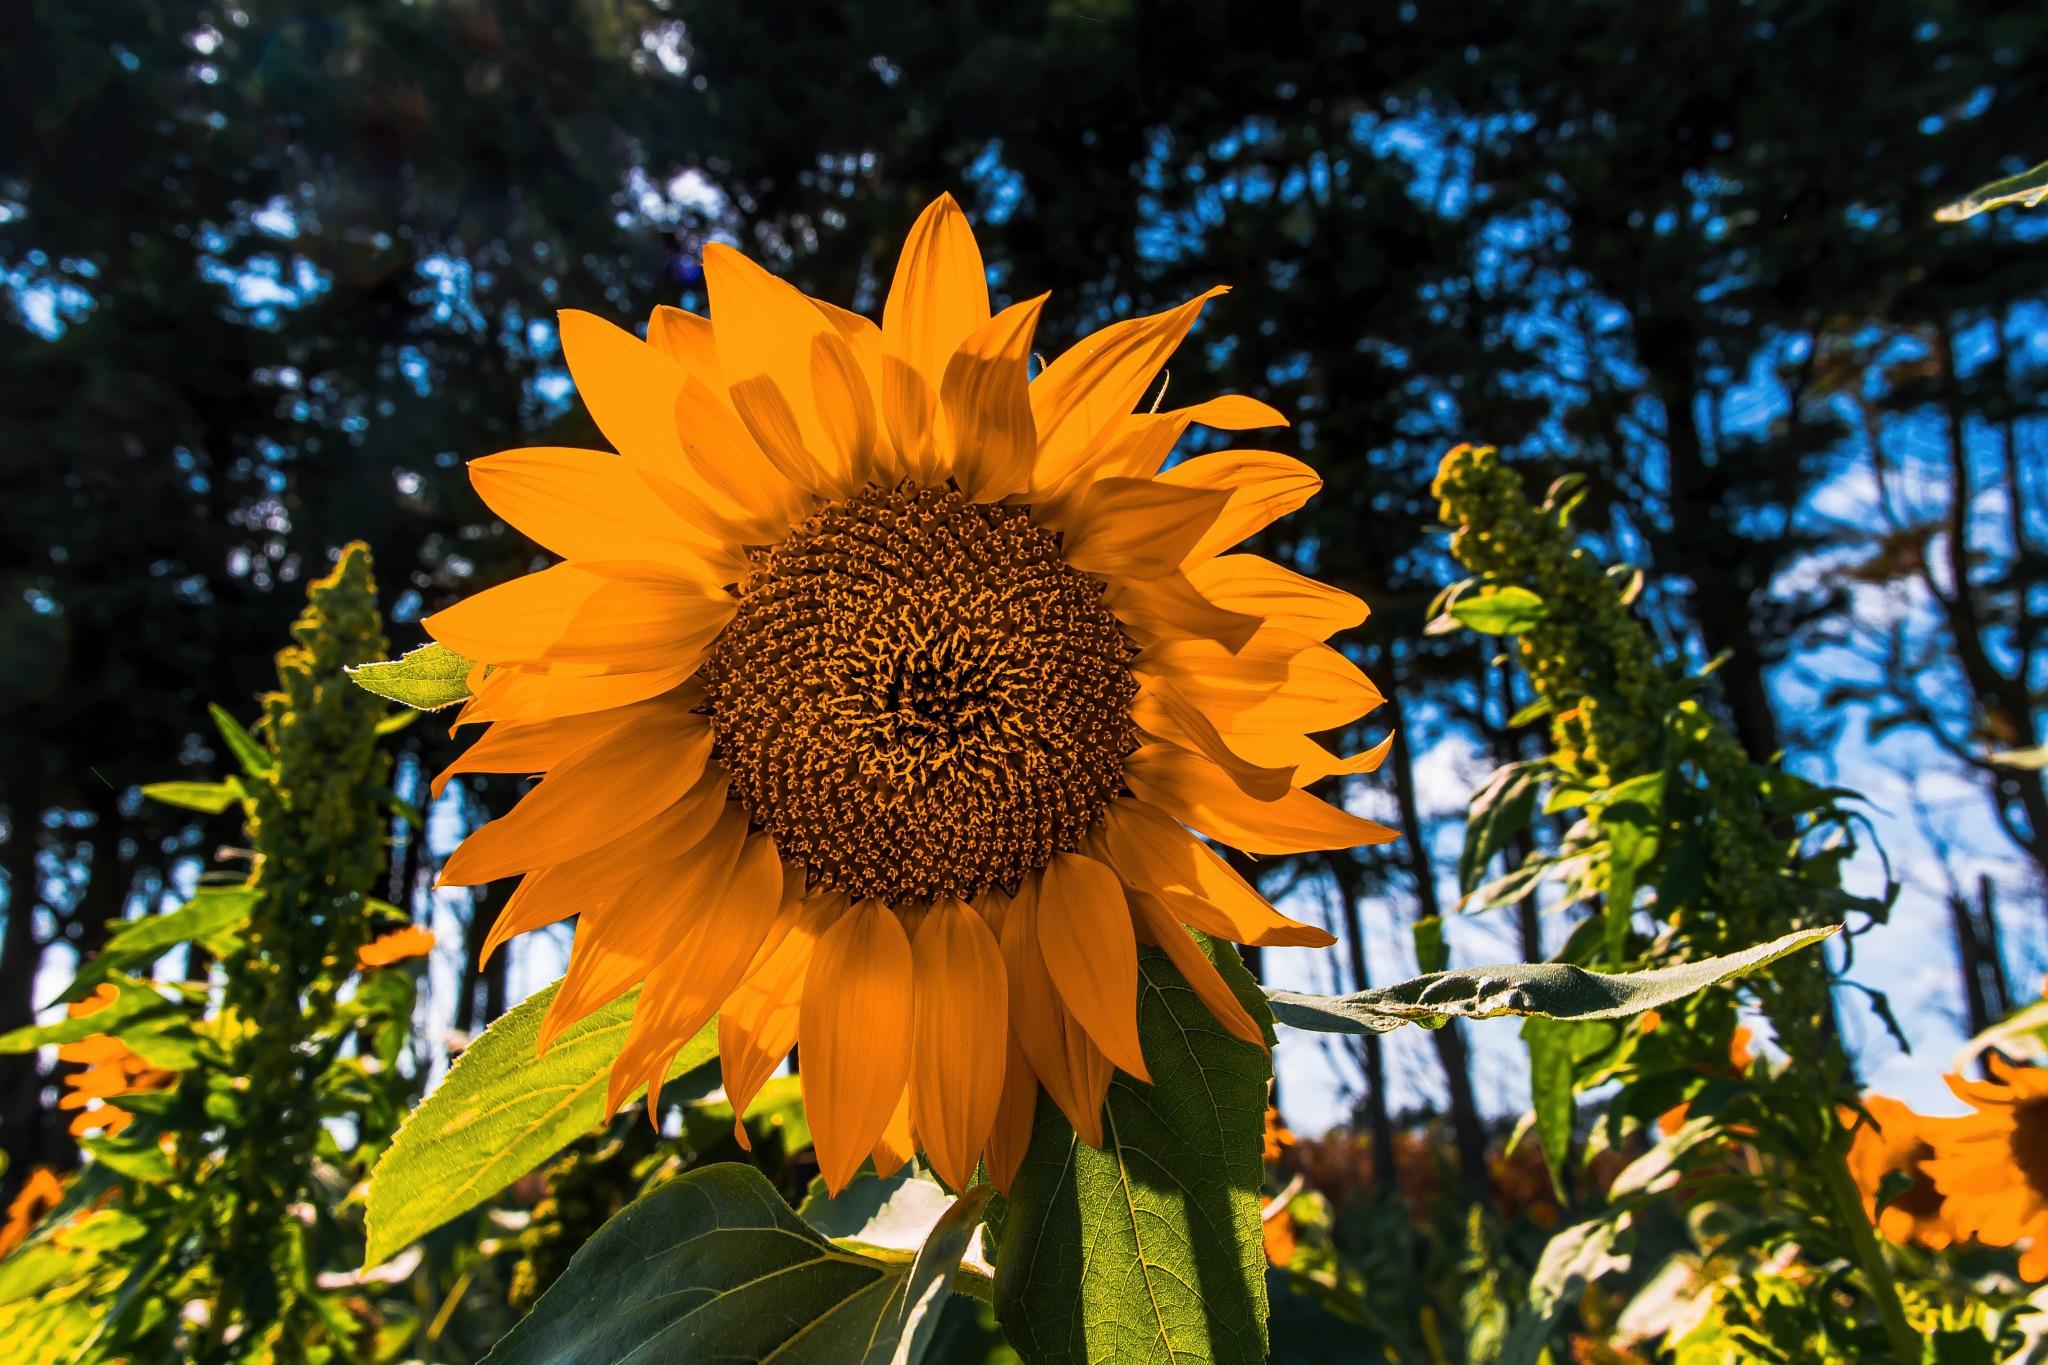 Helianthus or Sunflower  by Lightpimp - akadodjer